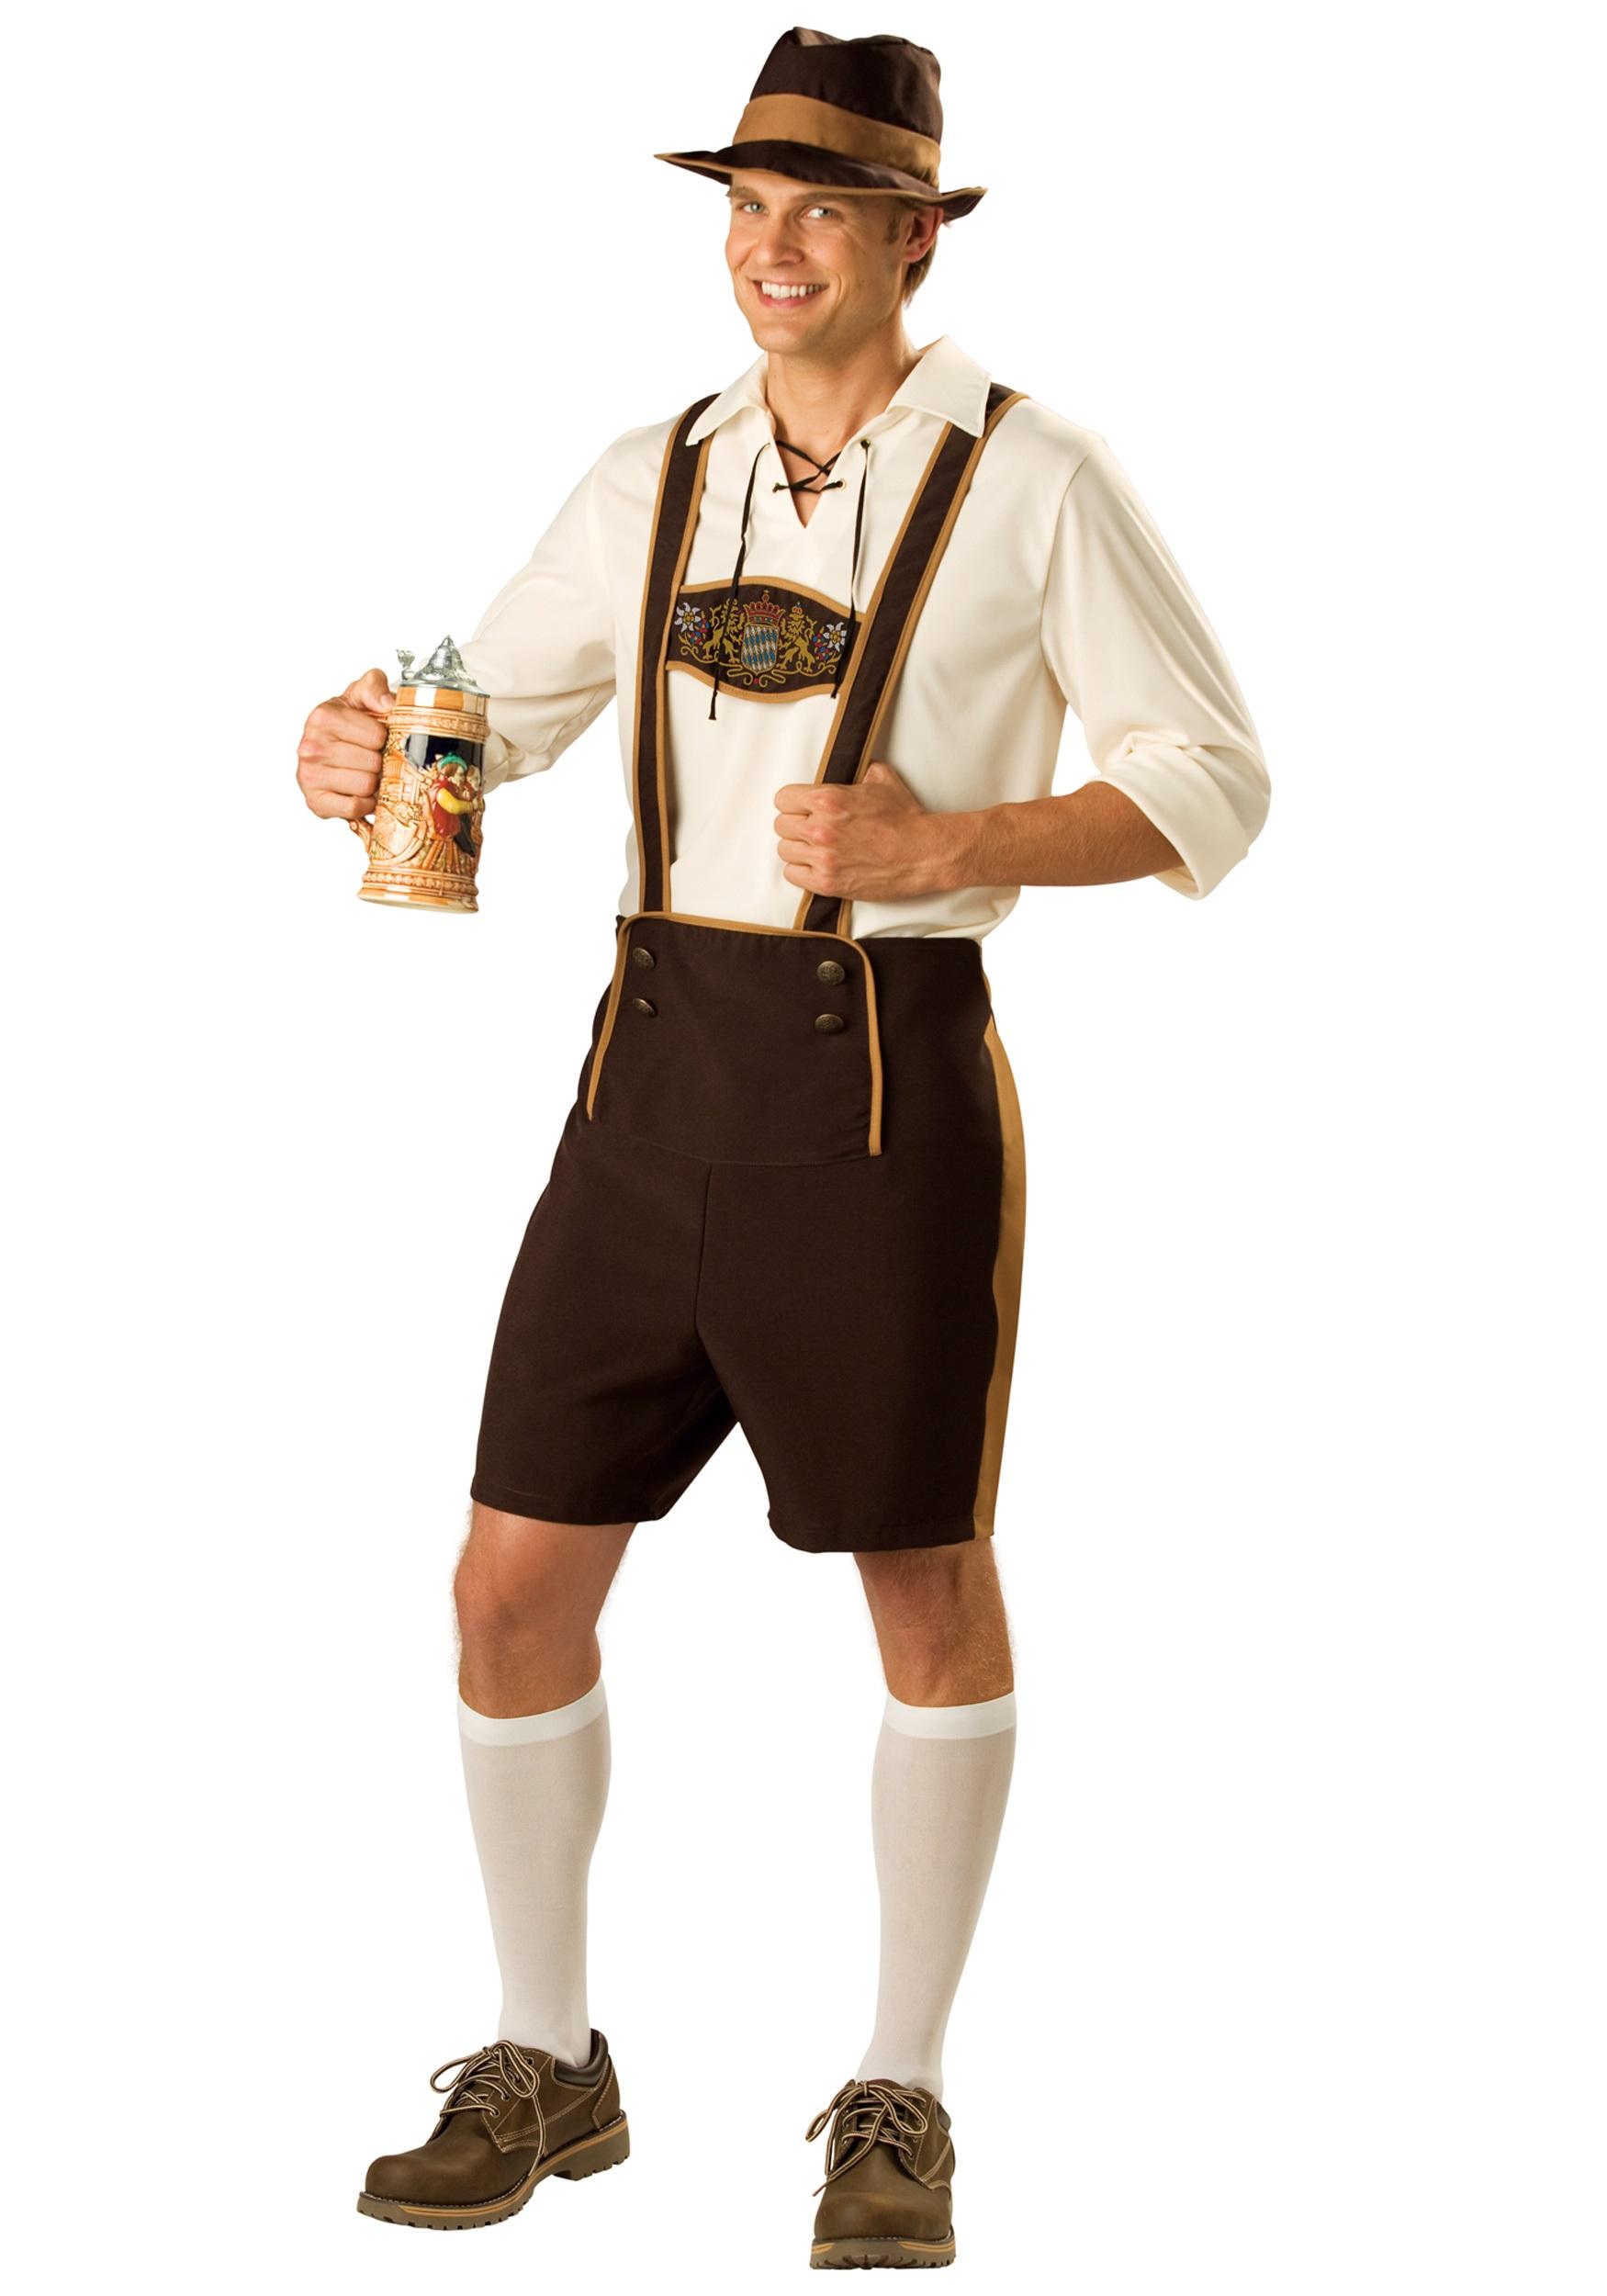 ... men's navy cotton blend 'Ino' bet at home liga mistrzów printed board shorts | Iicloth